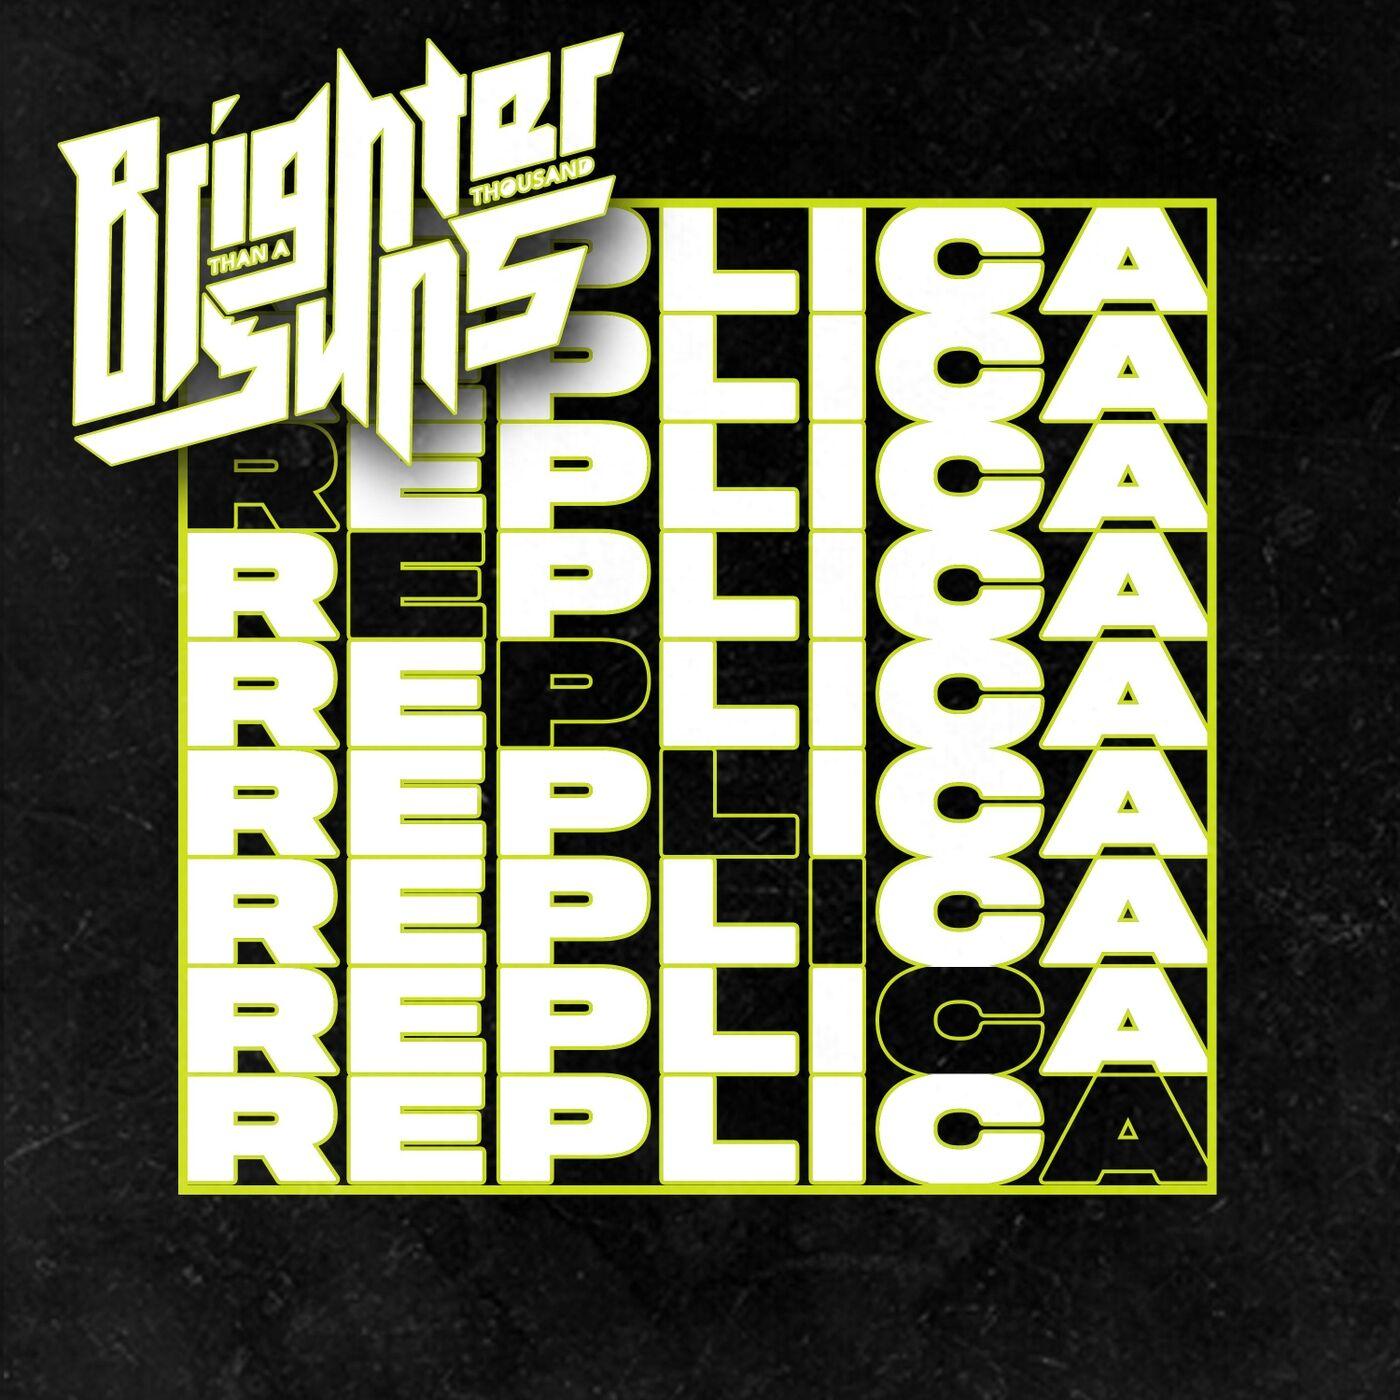 Brighter Than a Thousand Suns - Replica [single] (2020)